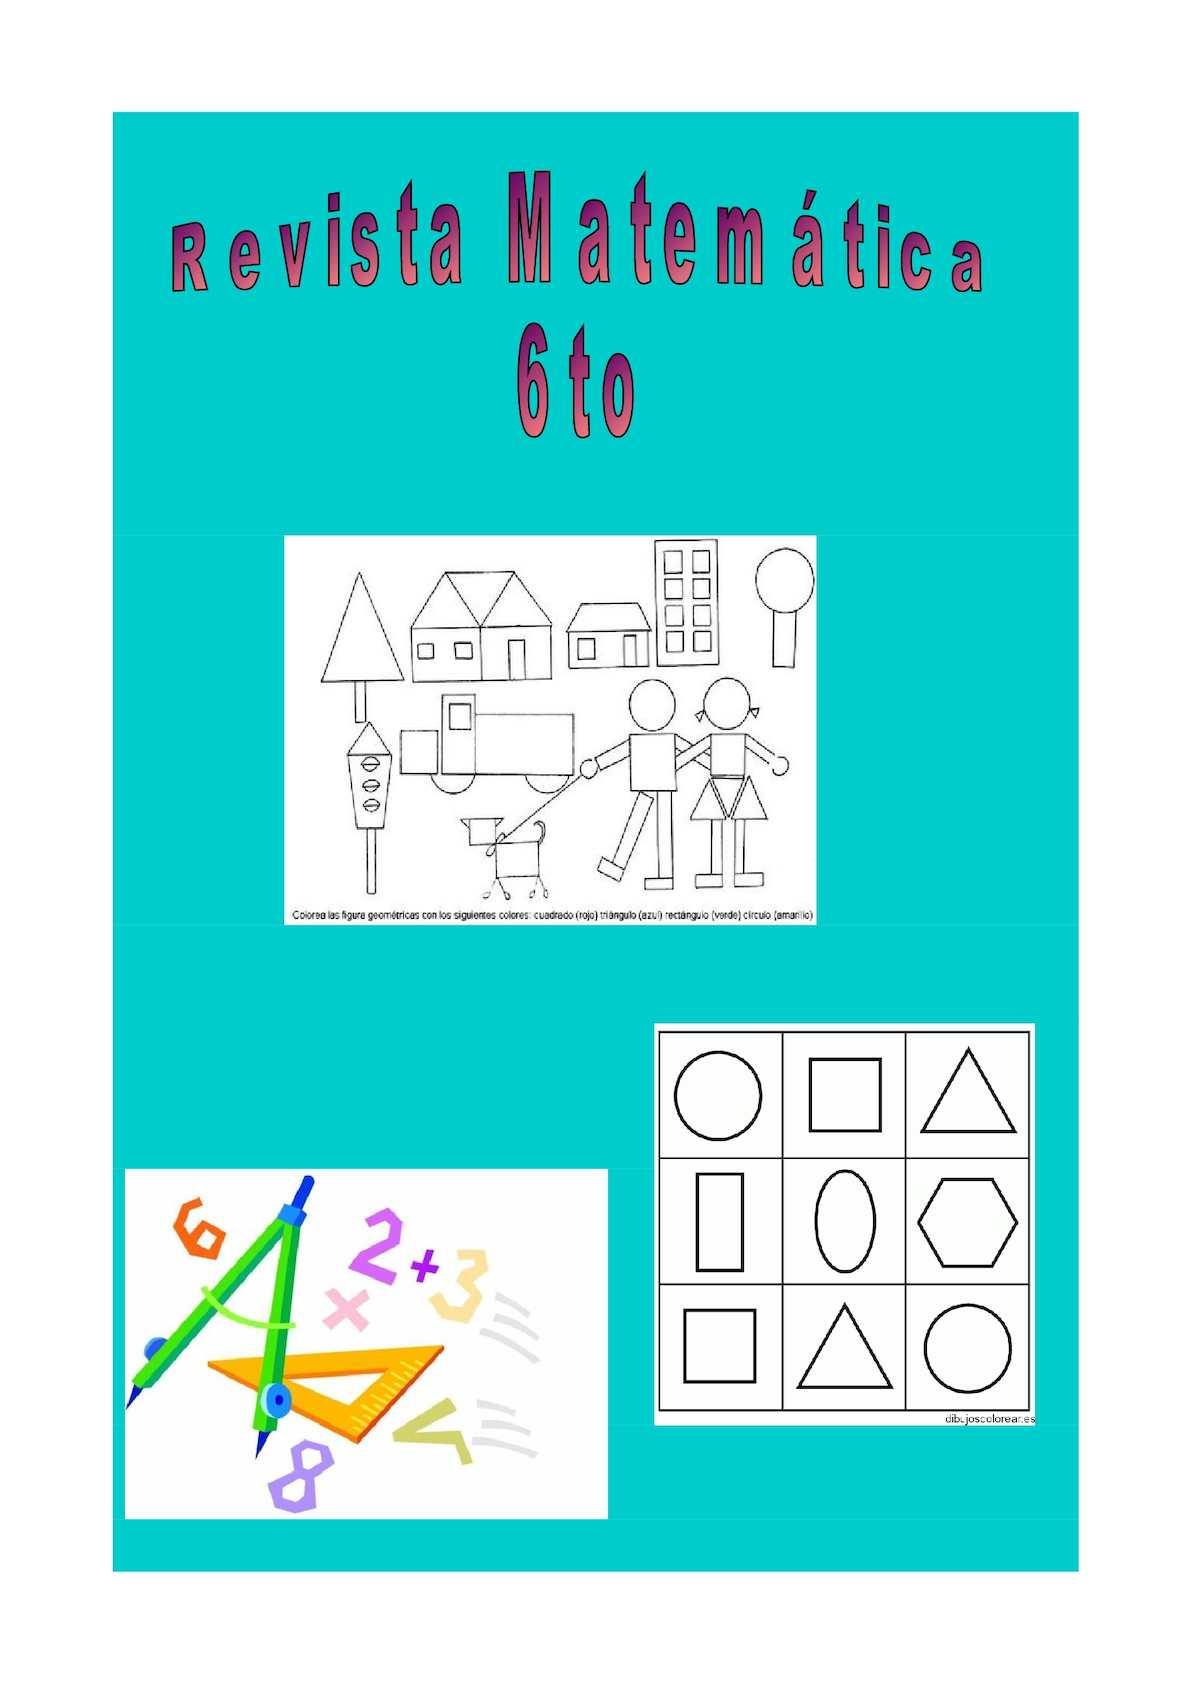 Revista Matematica 6to